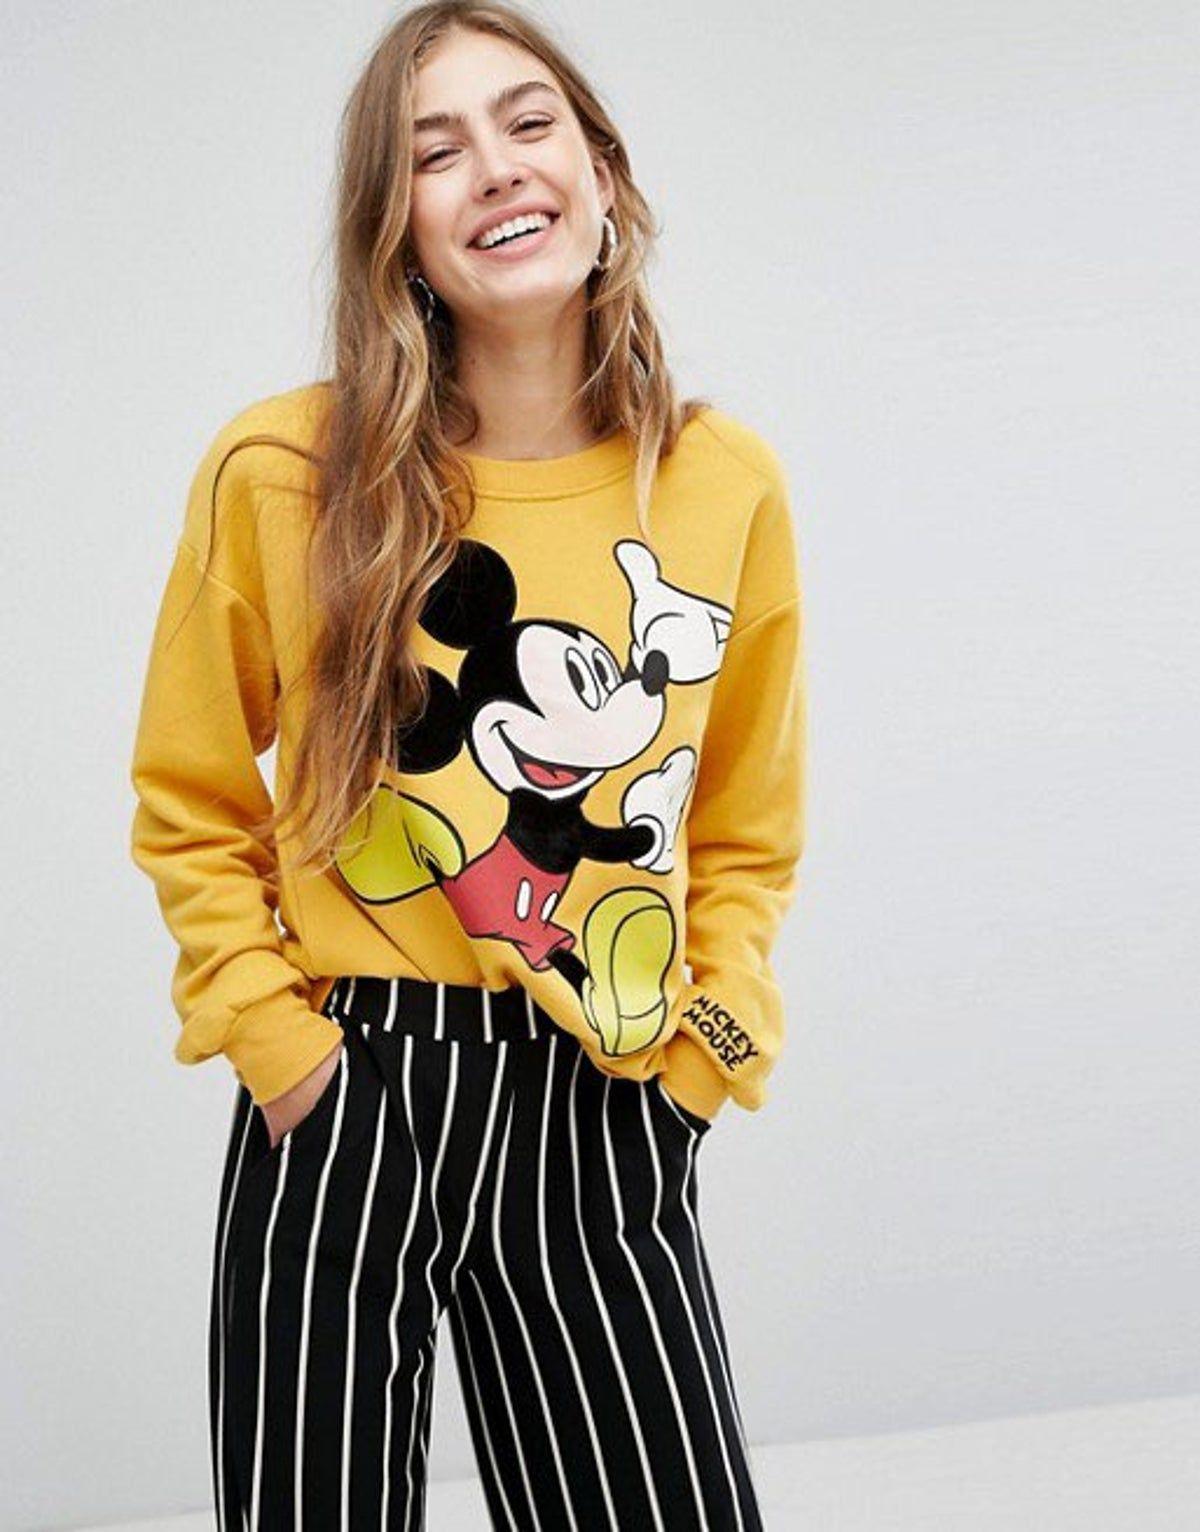 Bershka Mickey Mouse Sweatshirt Mickey Mouse Sweatshirt Mickey Mouse Outfit Cute Disney Outfits